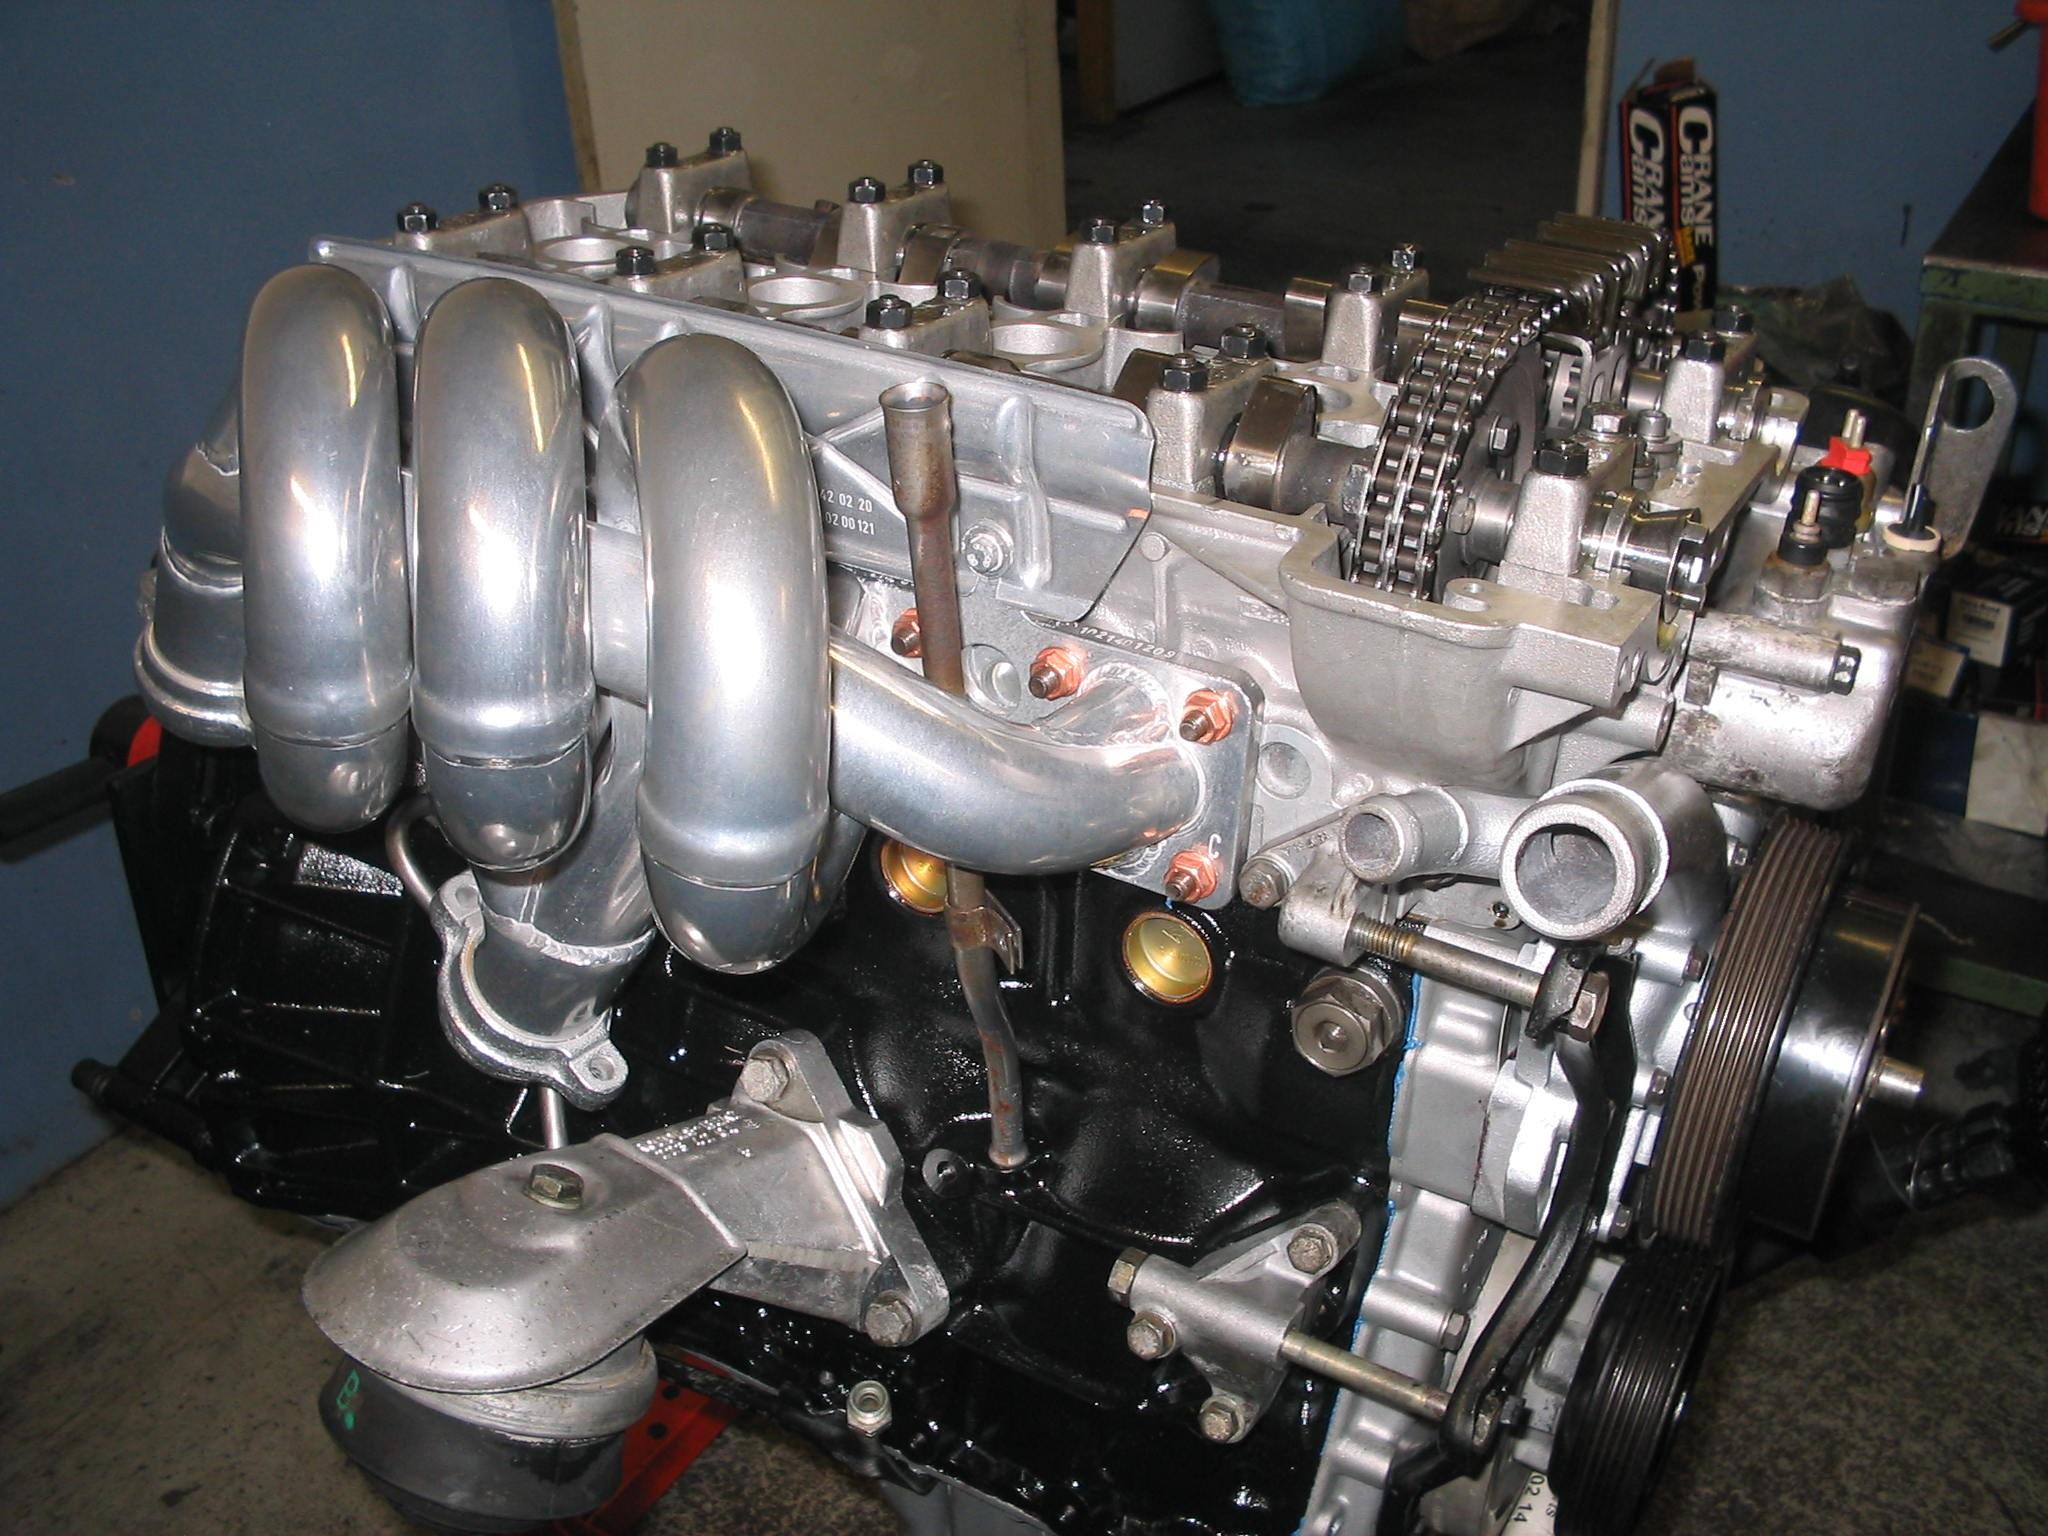 Advanced Business Marketing – Motor Engineering Business ABM ID #1934